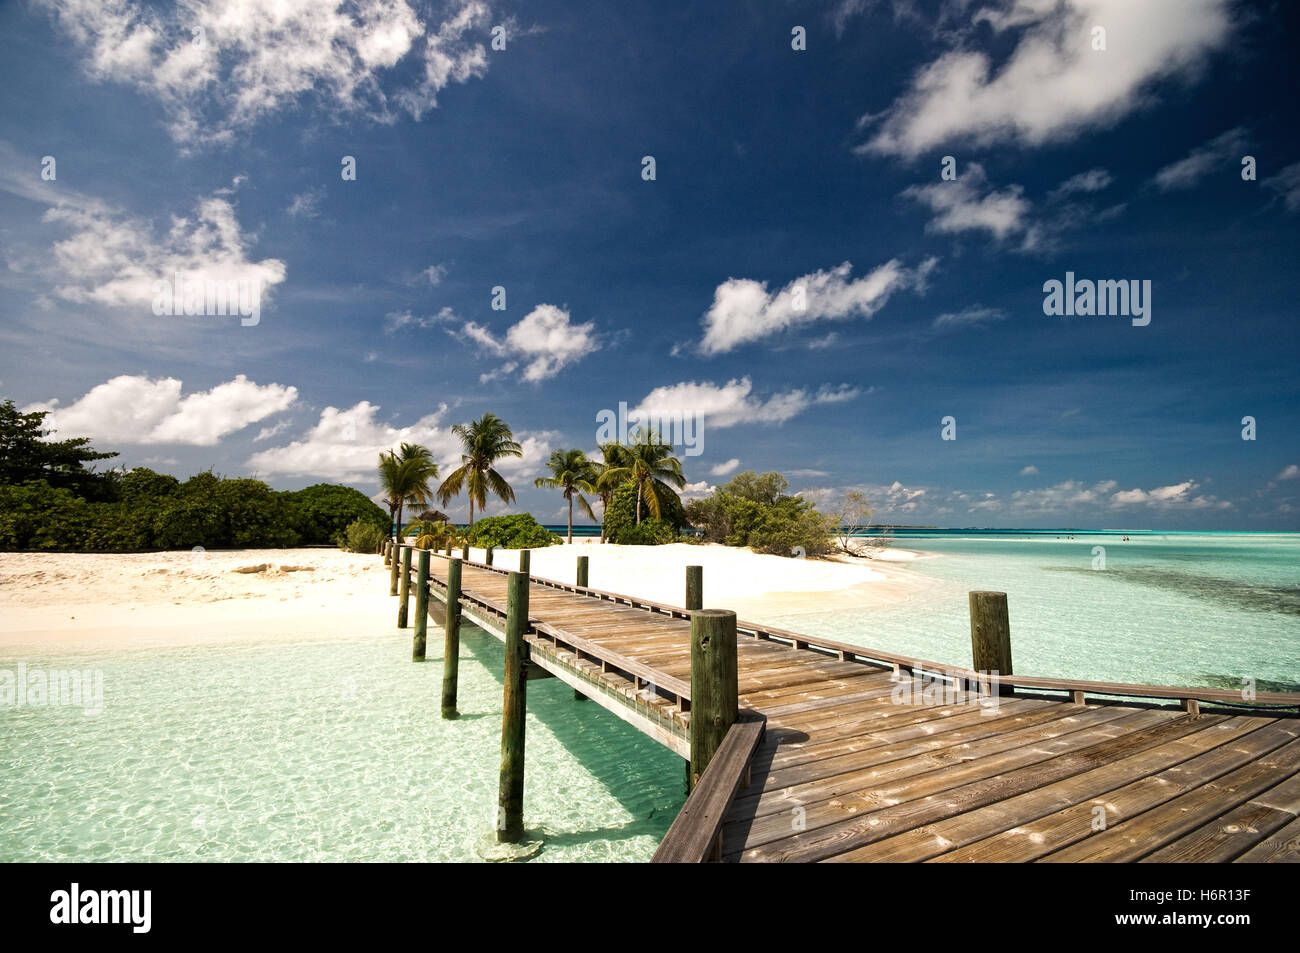 wooden bridge to desert island - Stock Image